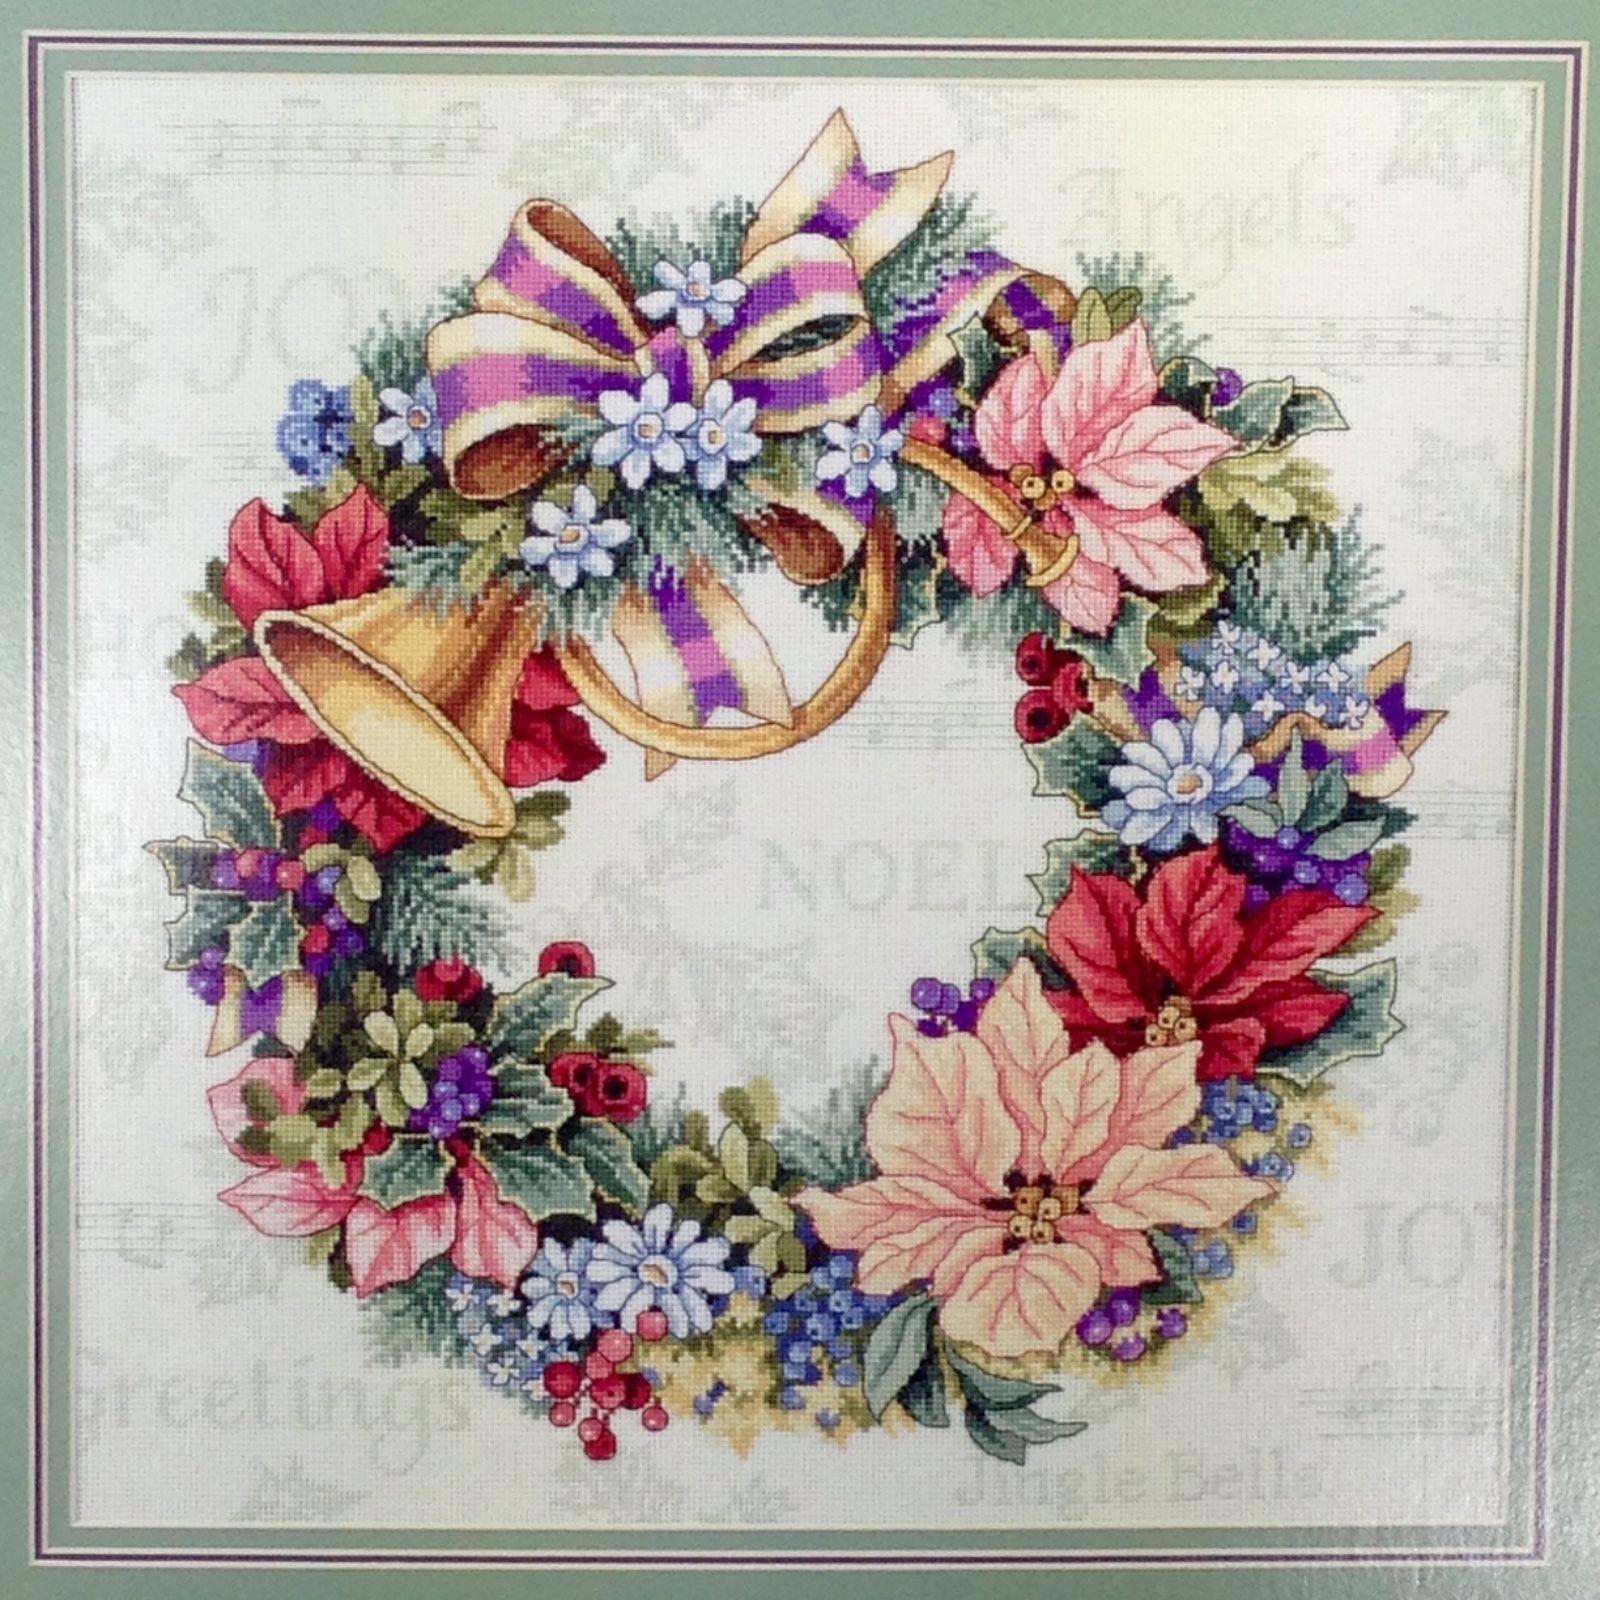 Dimensions Holiday Harmony Wreath (Венок Праздник гармонии).8662 СШАНабор для вышивания Dimensions 8662 Holiday Harmony Wreath (Венок Праздник гармонии)<br>